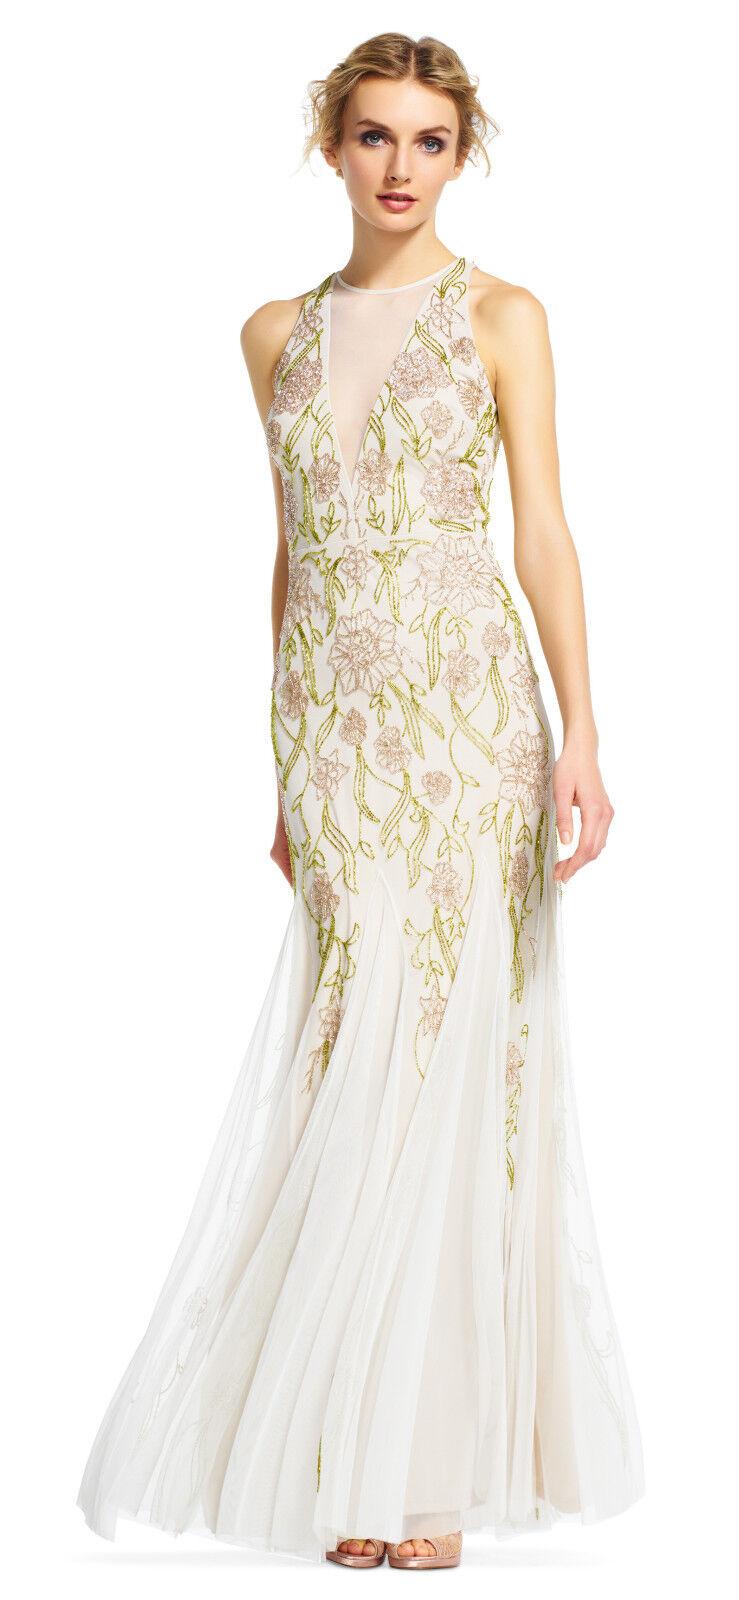 Adrianna Papell Ivory Multi Floral Beaded Halter Dress With Godet Skirt 12   329